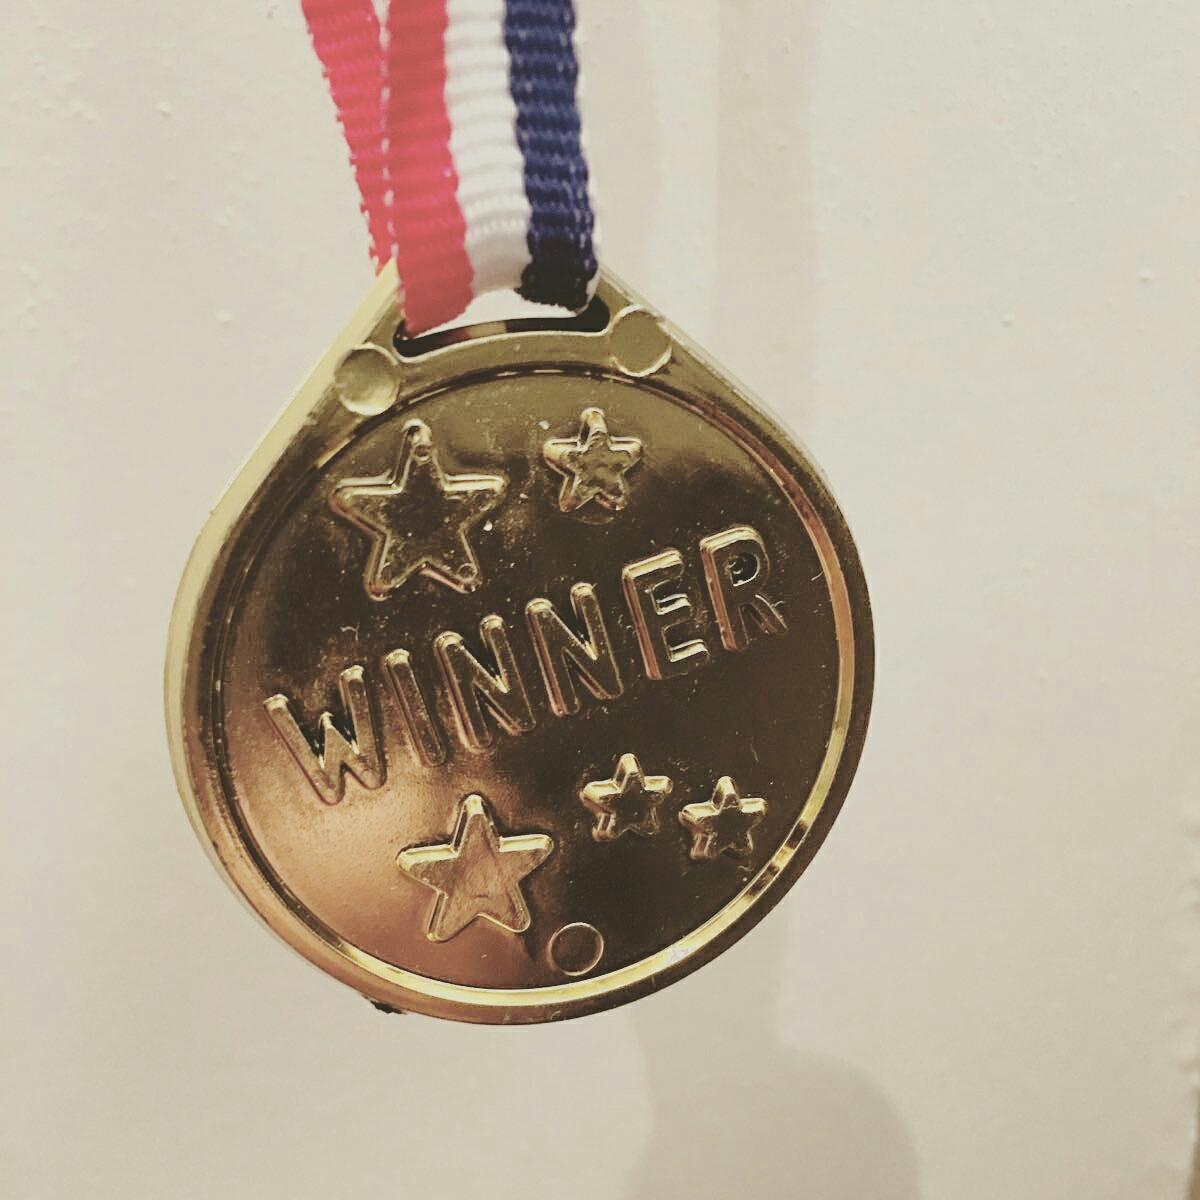 My prize for winning last week's Marathon.